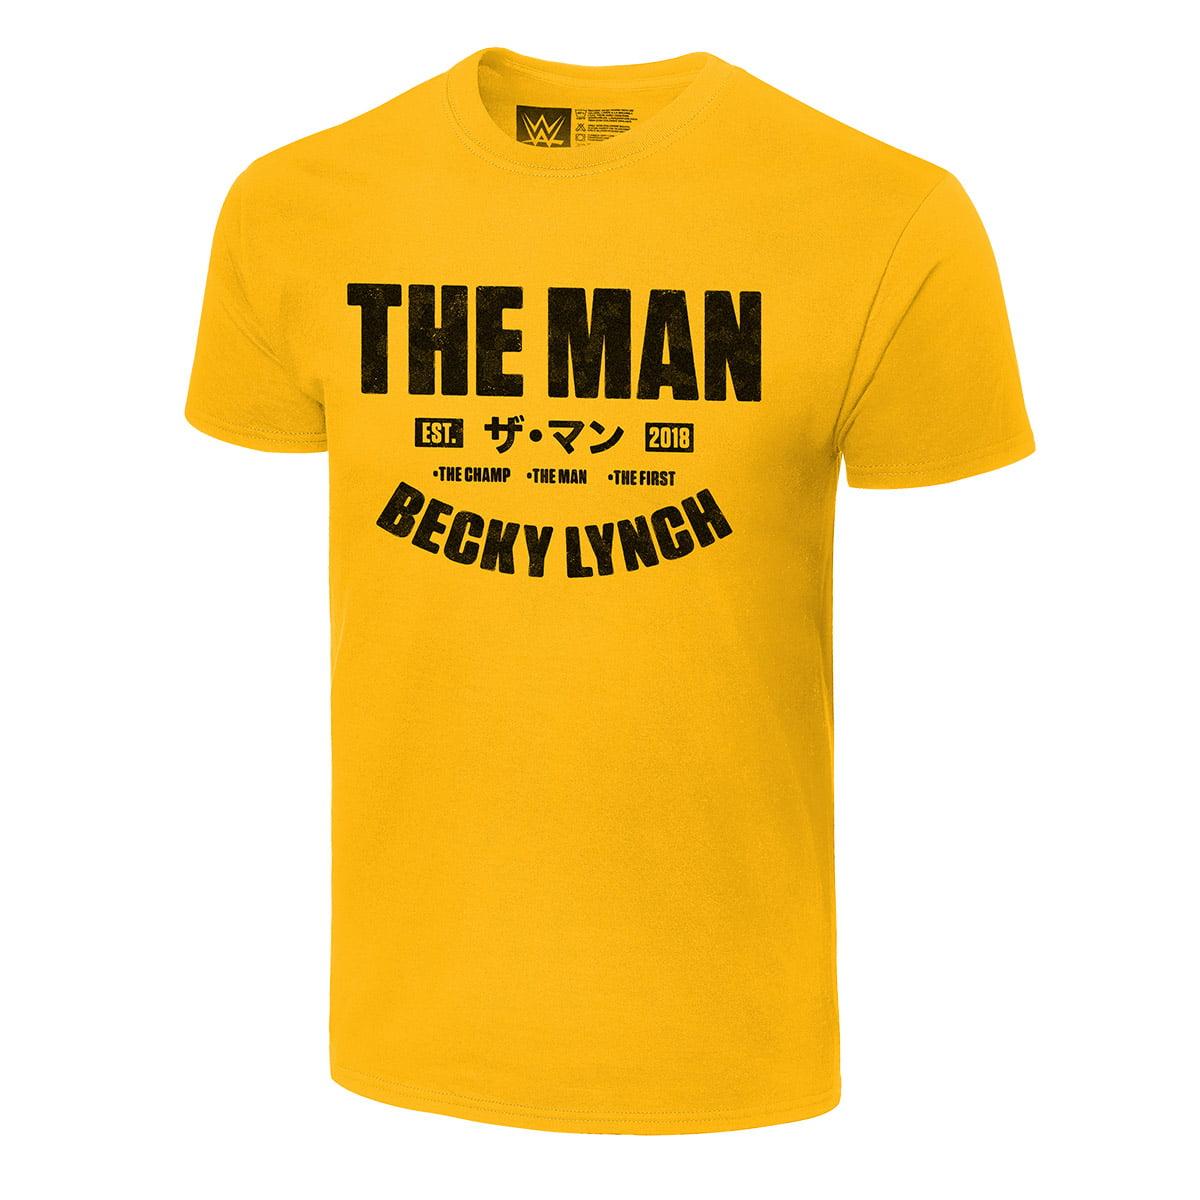 Becky Lynch The Man T-Shirt Men Women Unisex Funny Tshirt All Size S-3XL